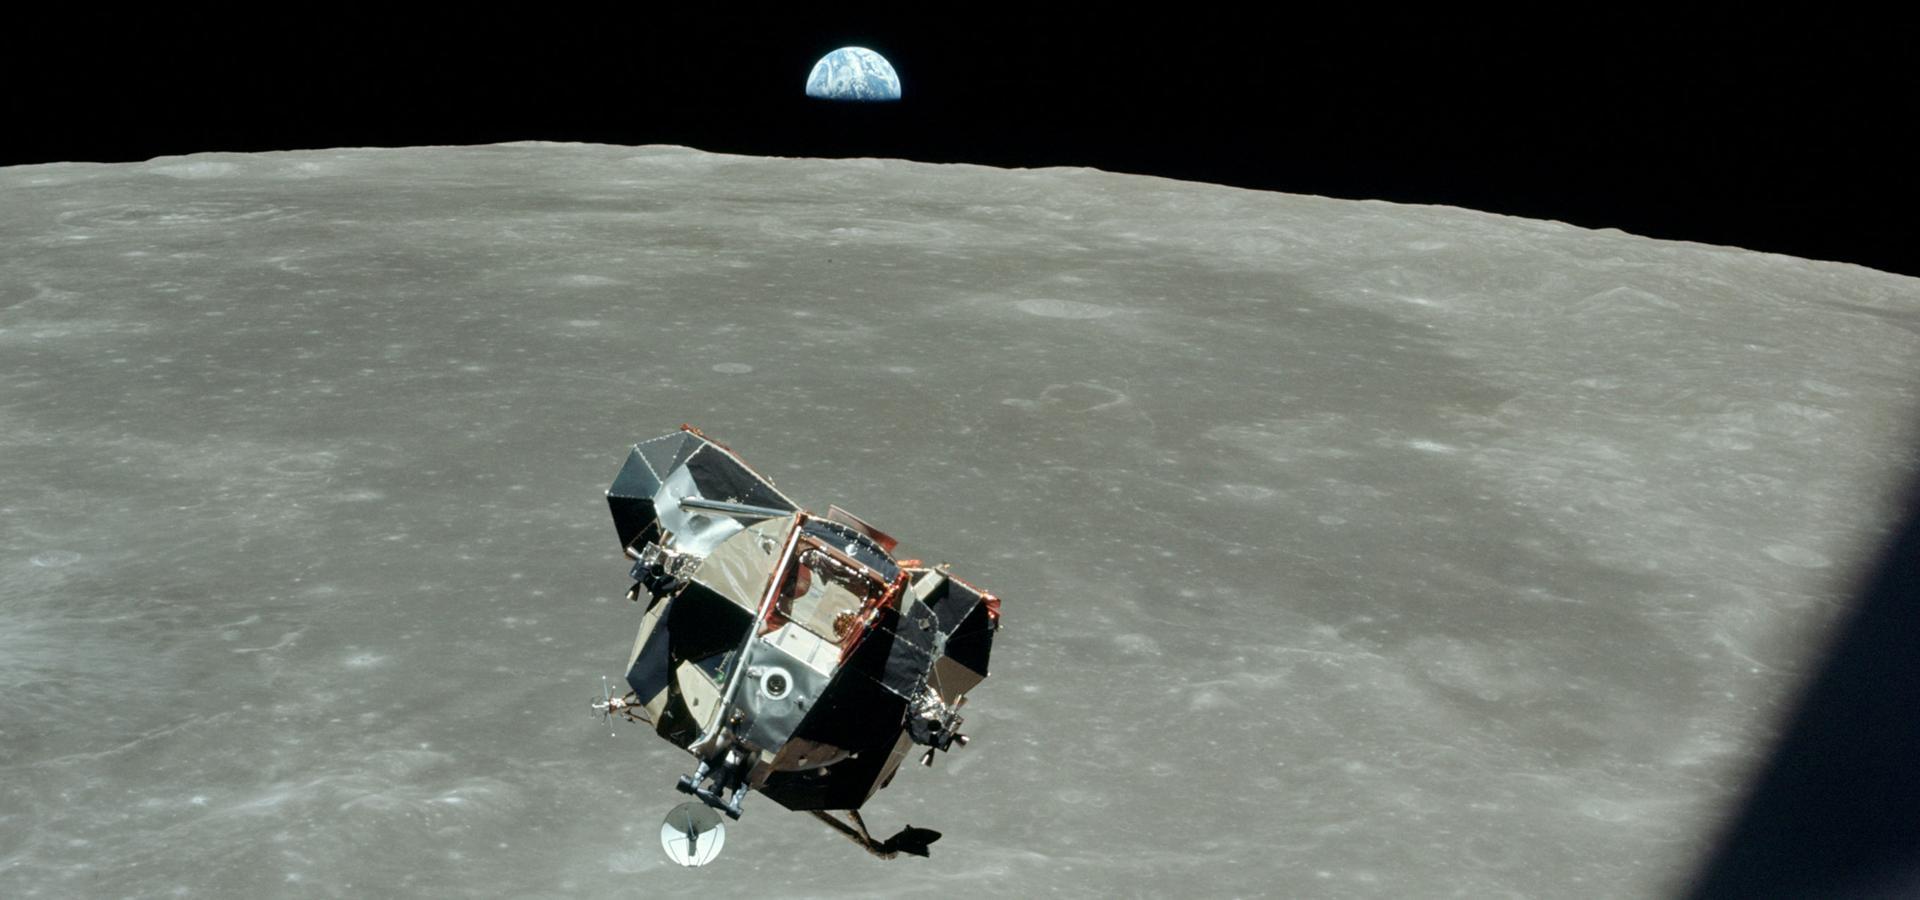 LEM ascent to command capsule apollo 11